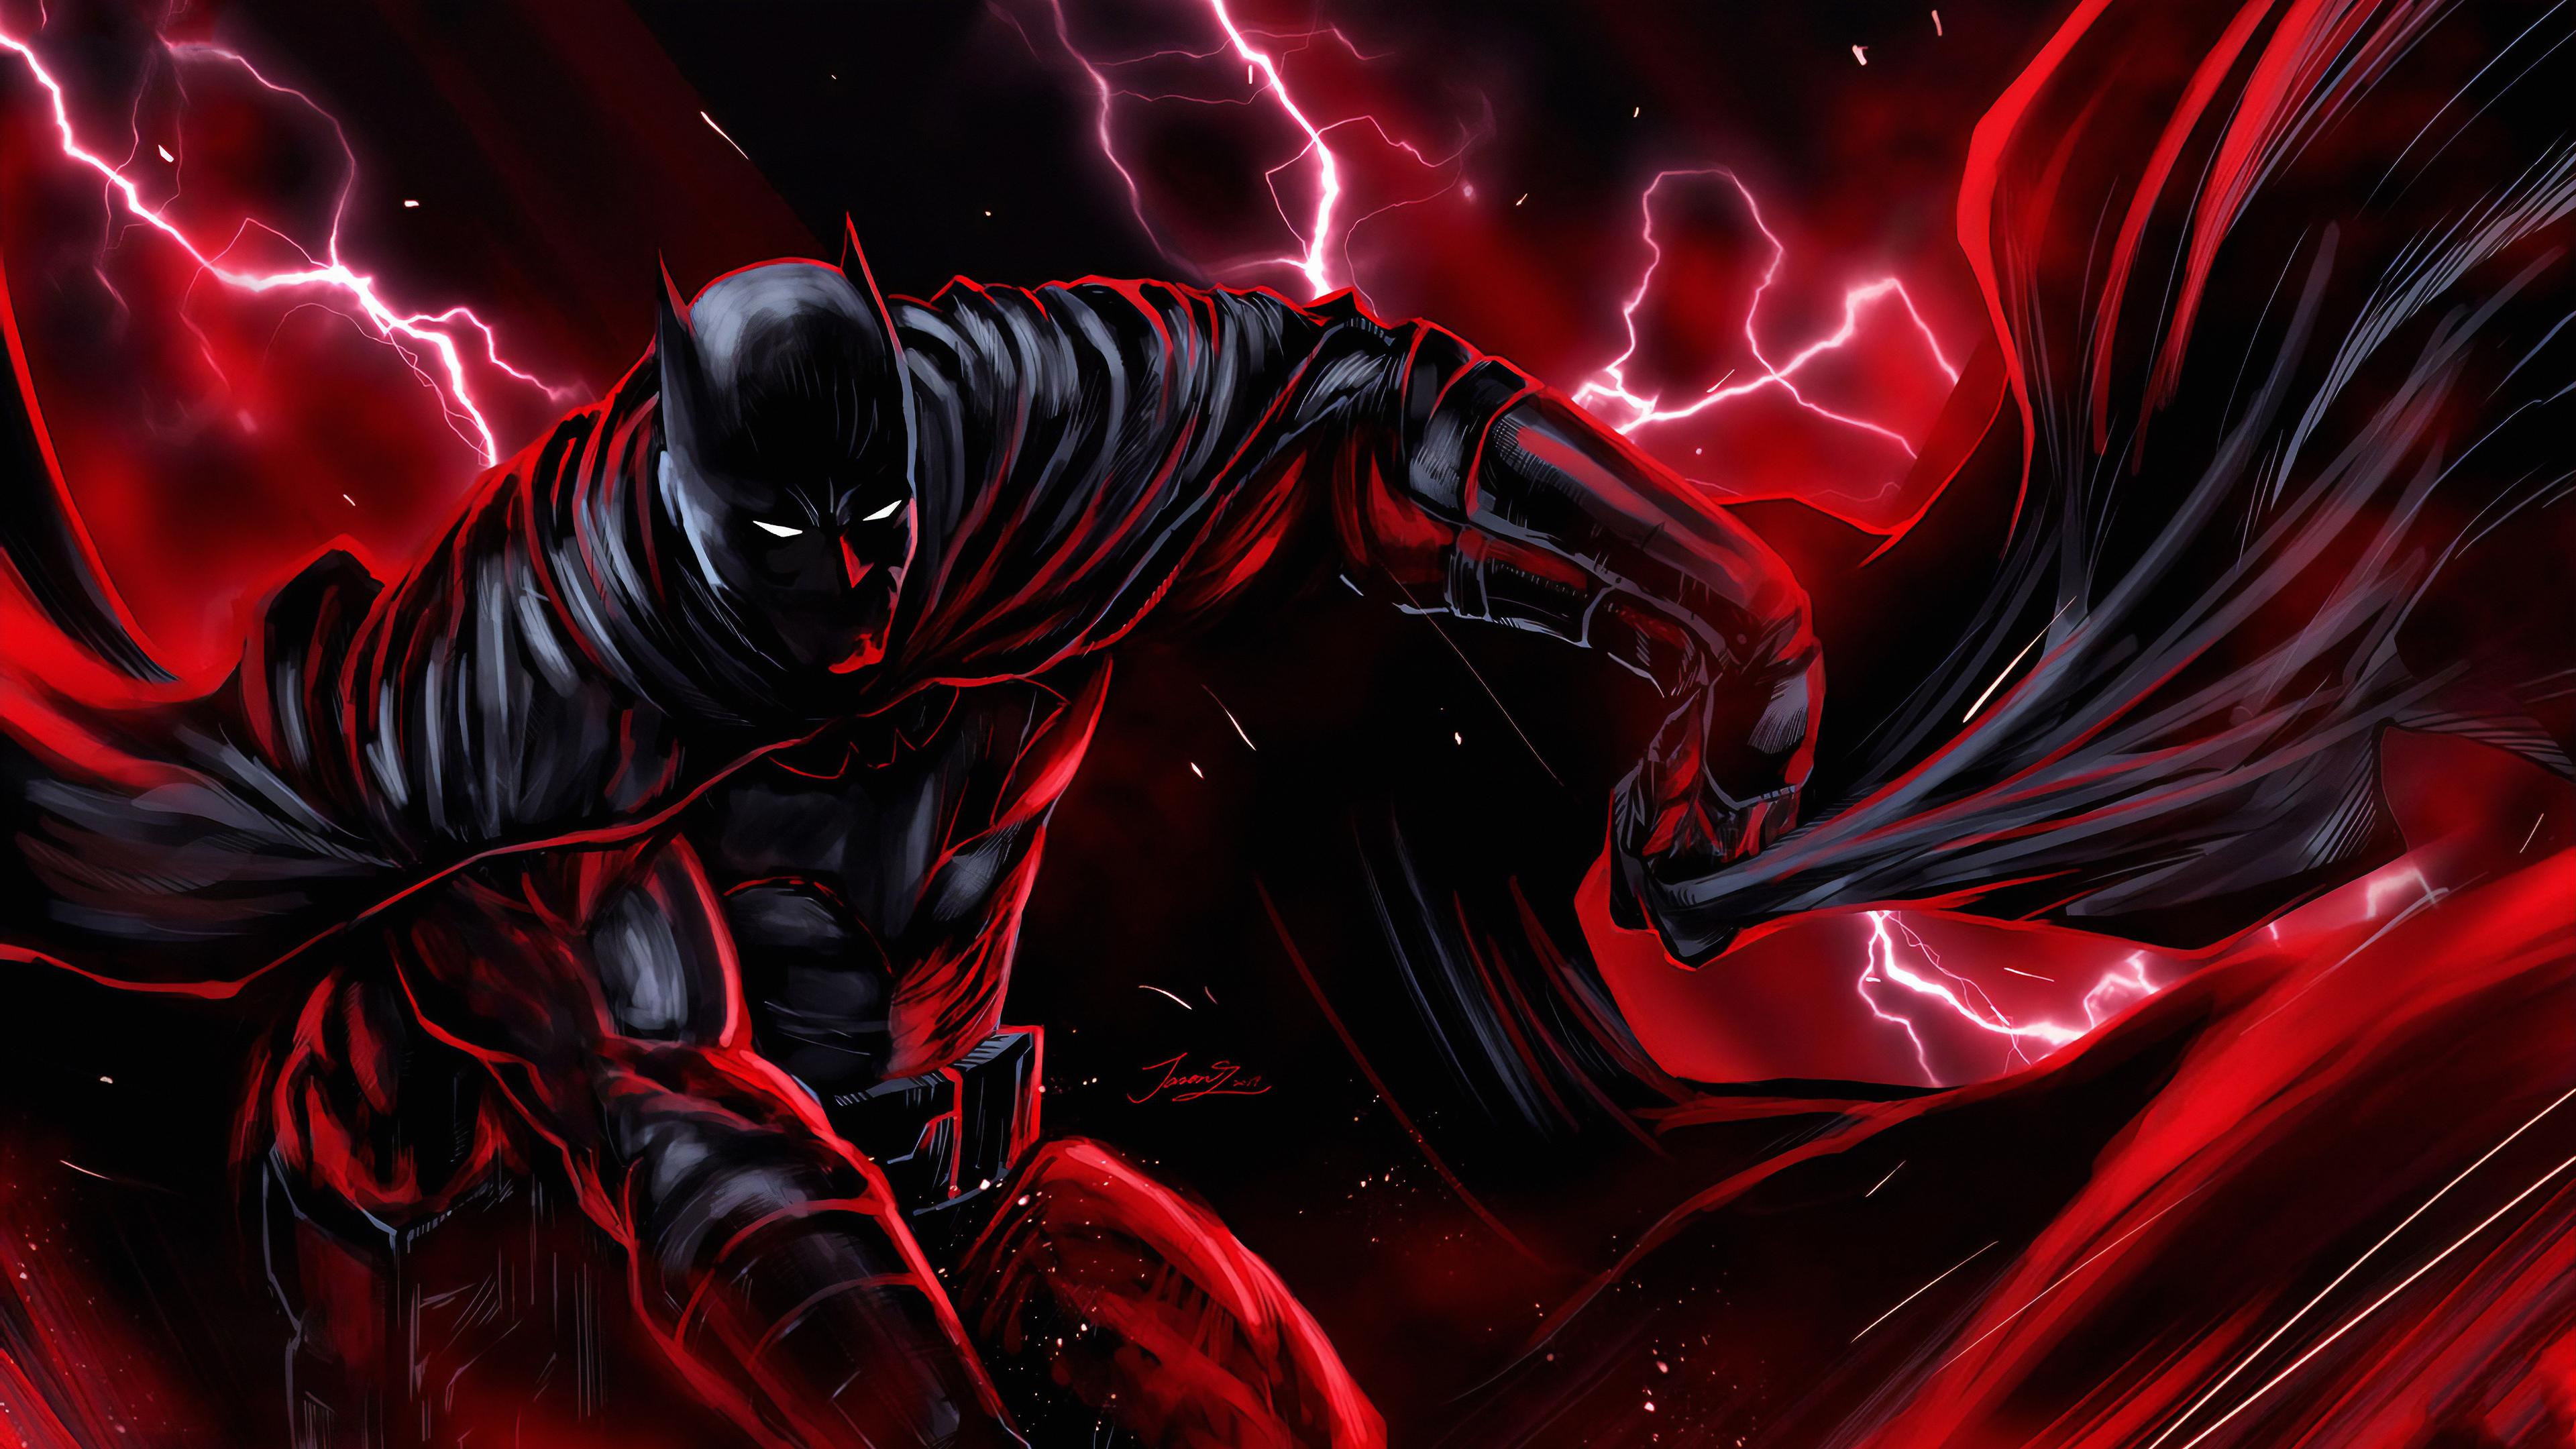 batman 4k knight 1562106142 - Batman 4k Knight - superheroes wallpapers, hd-wallpapers, digital art wallpapers, behance wallpapers, batman wallpapers, artwork wallpapers, 4k-wallpapers